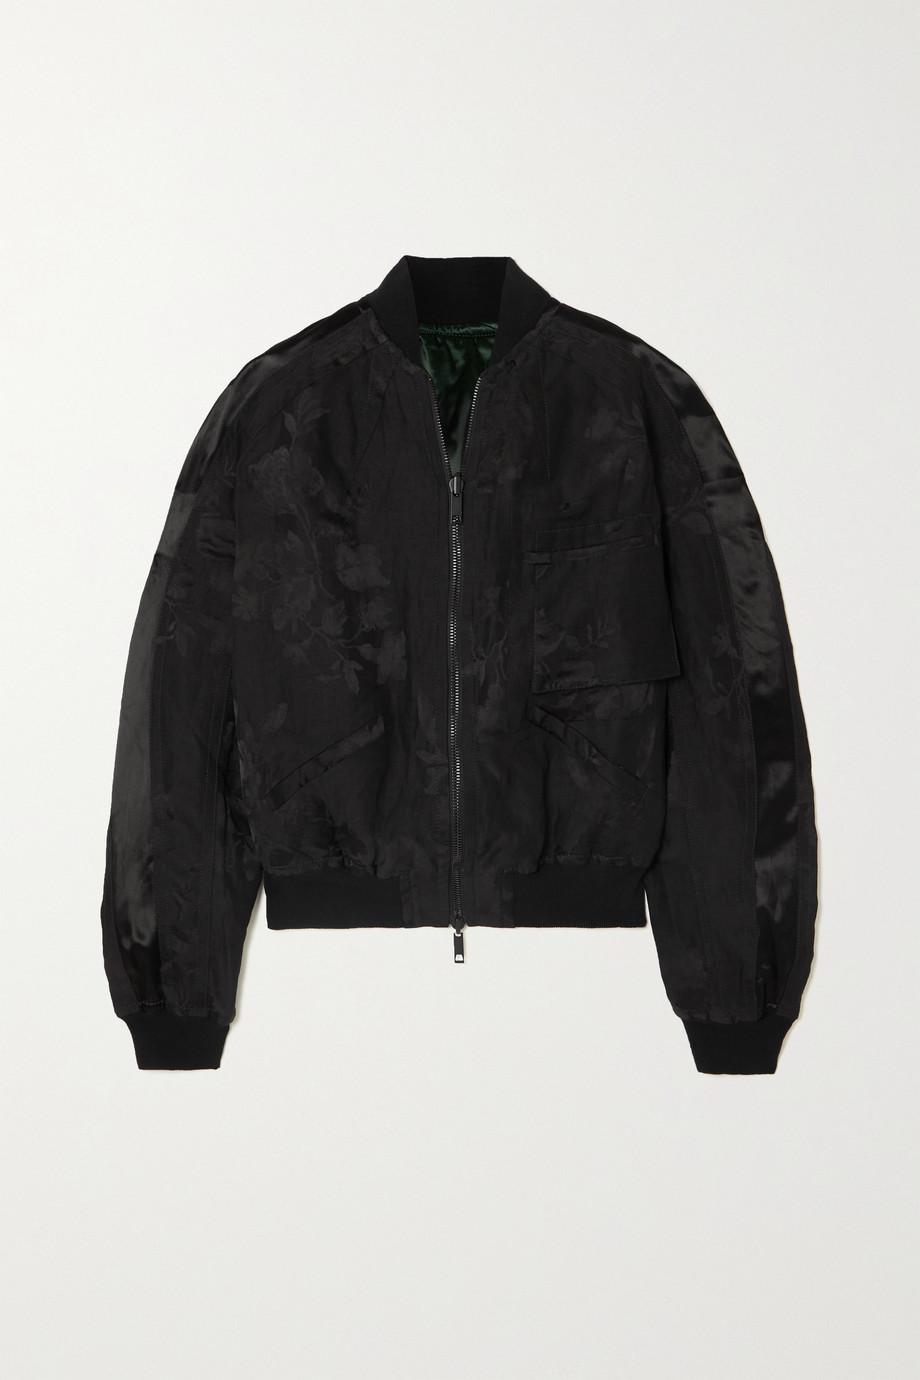 Haider Ackermann Reversible satin and floral-jacquard bomber jacket